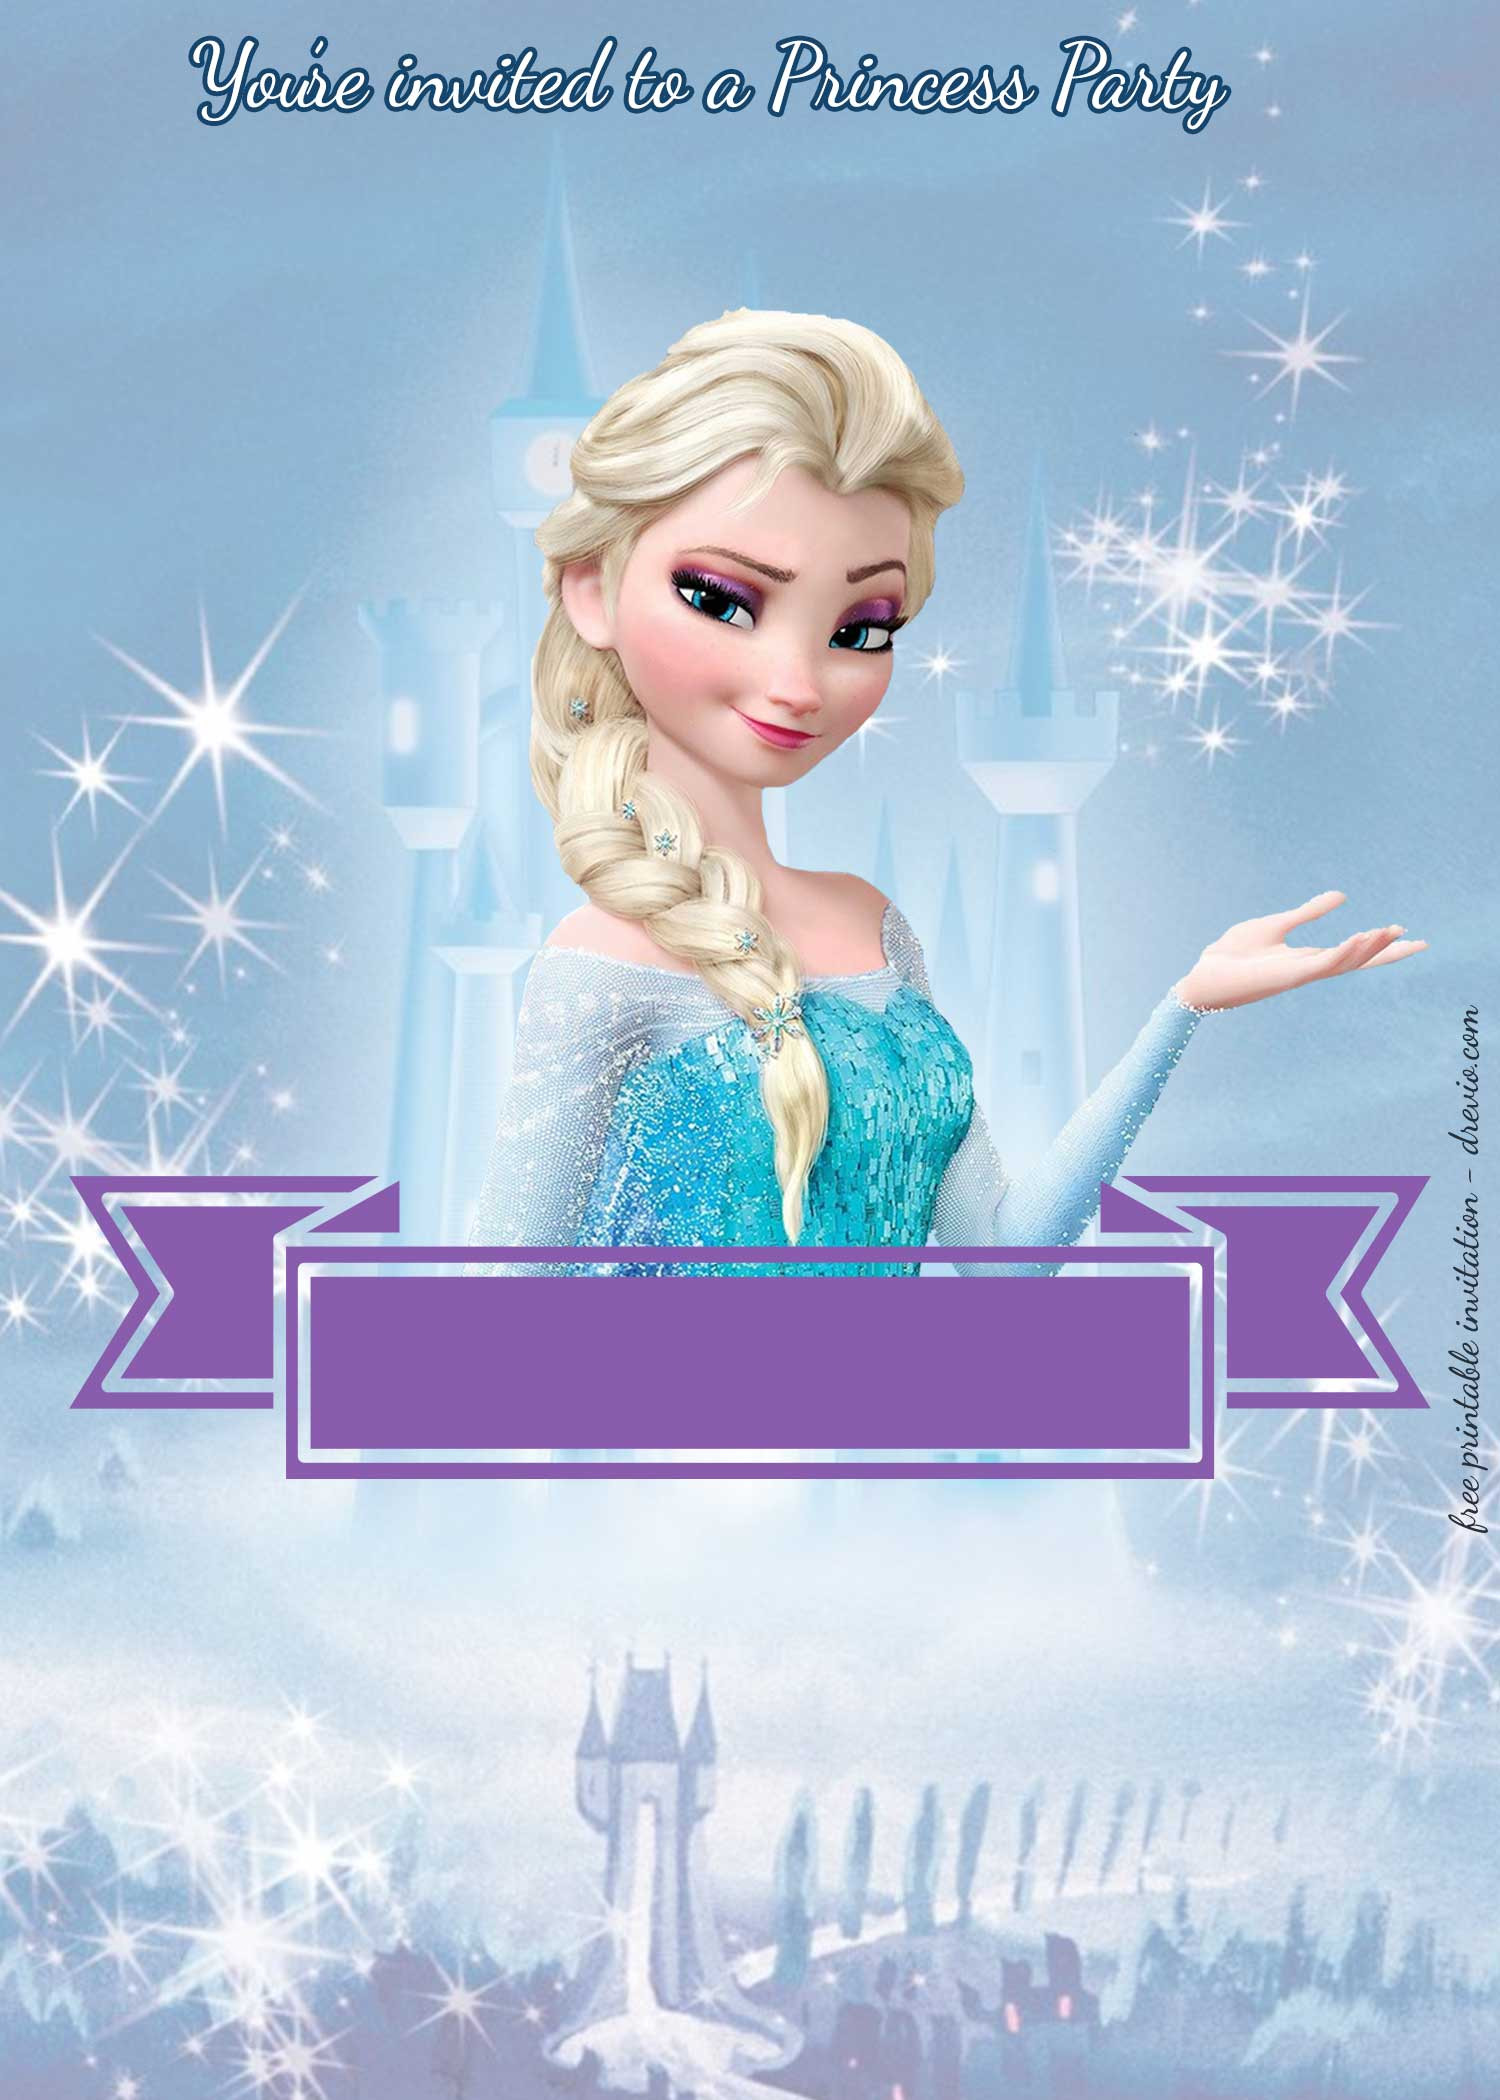 Frozen Invitations Printable Free Princess Party Invitation—princess Elsa Frozen